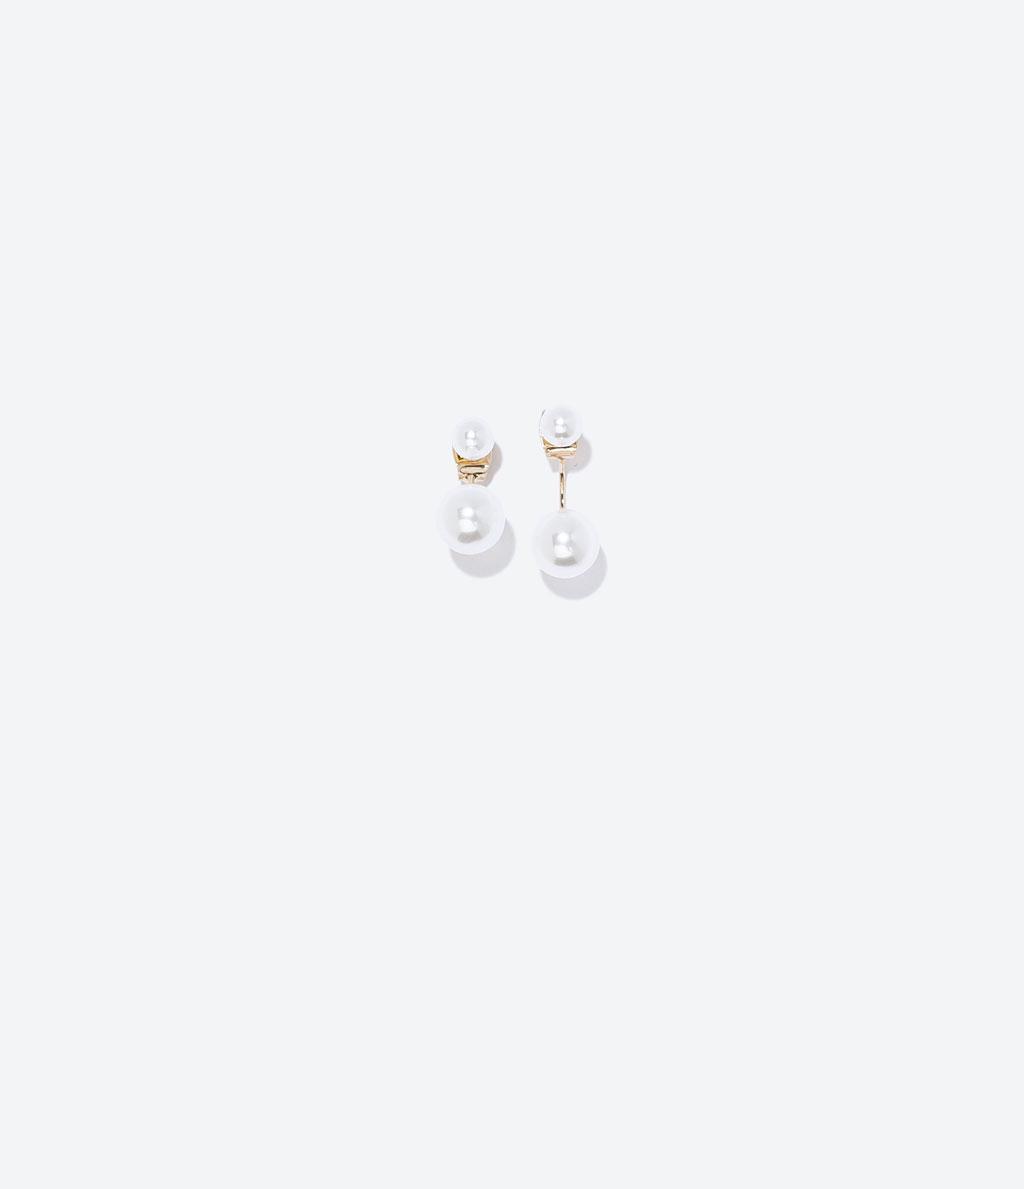 ZARA 珍珠耳環 NT$590